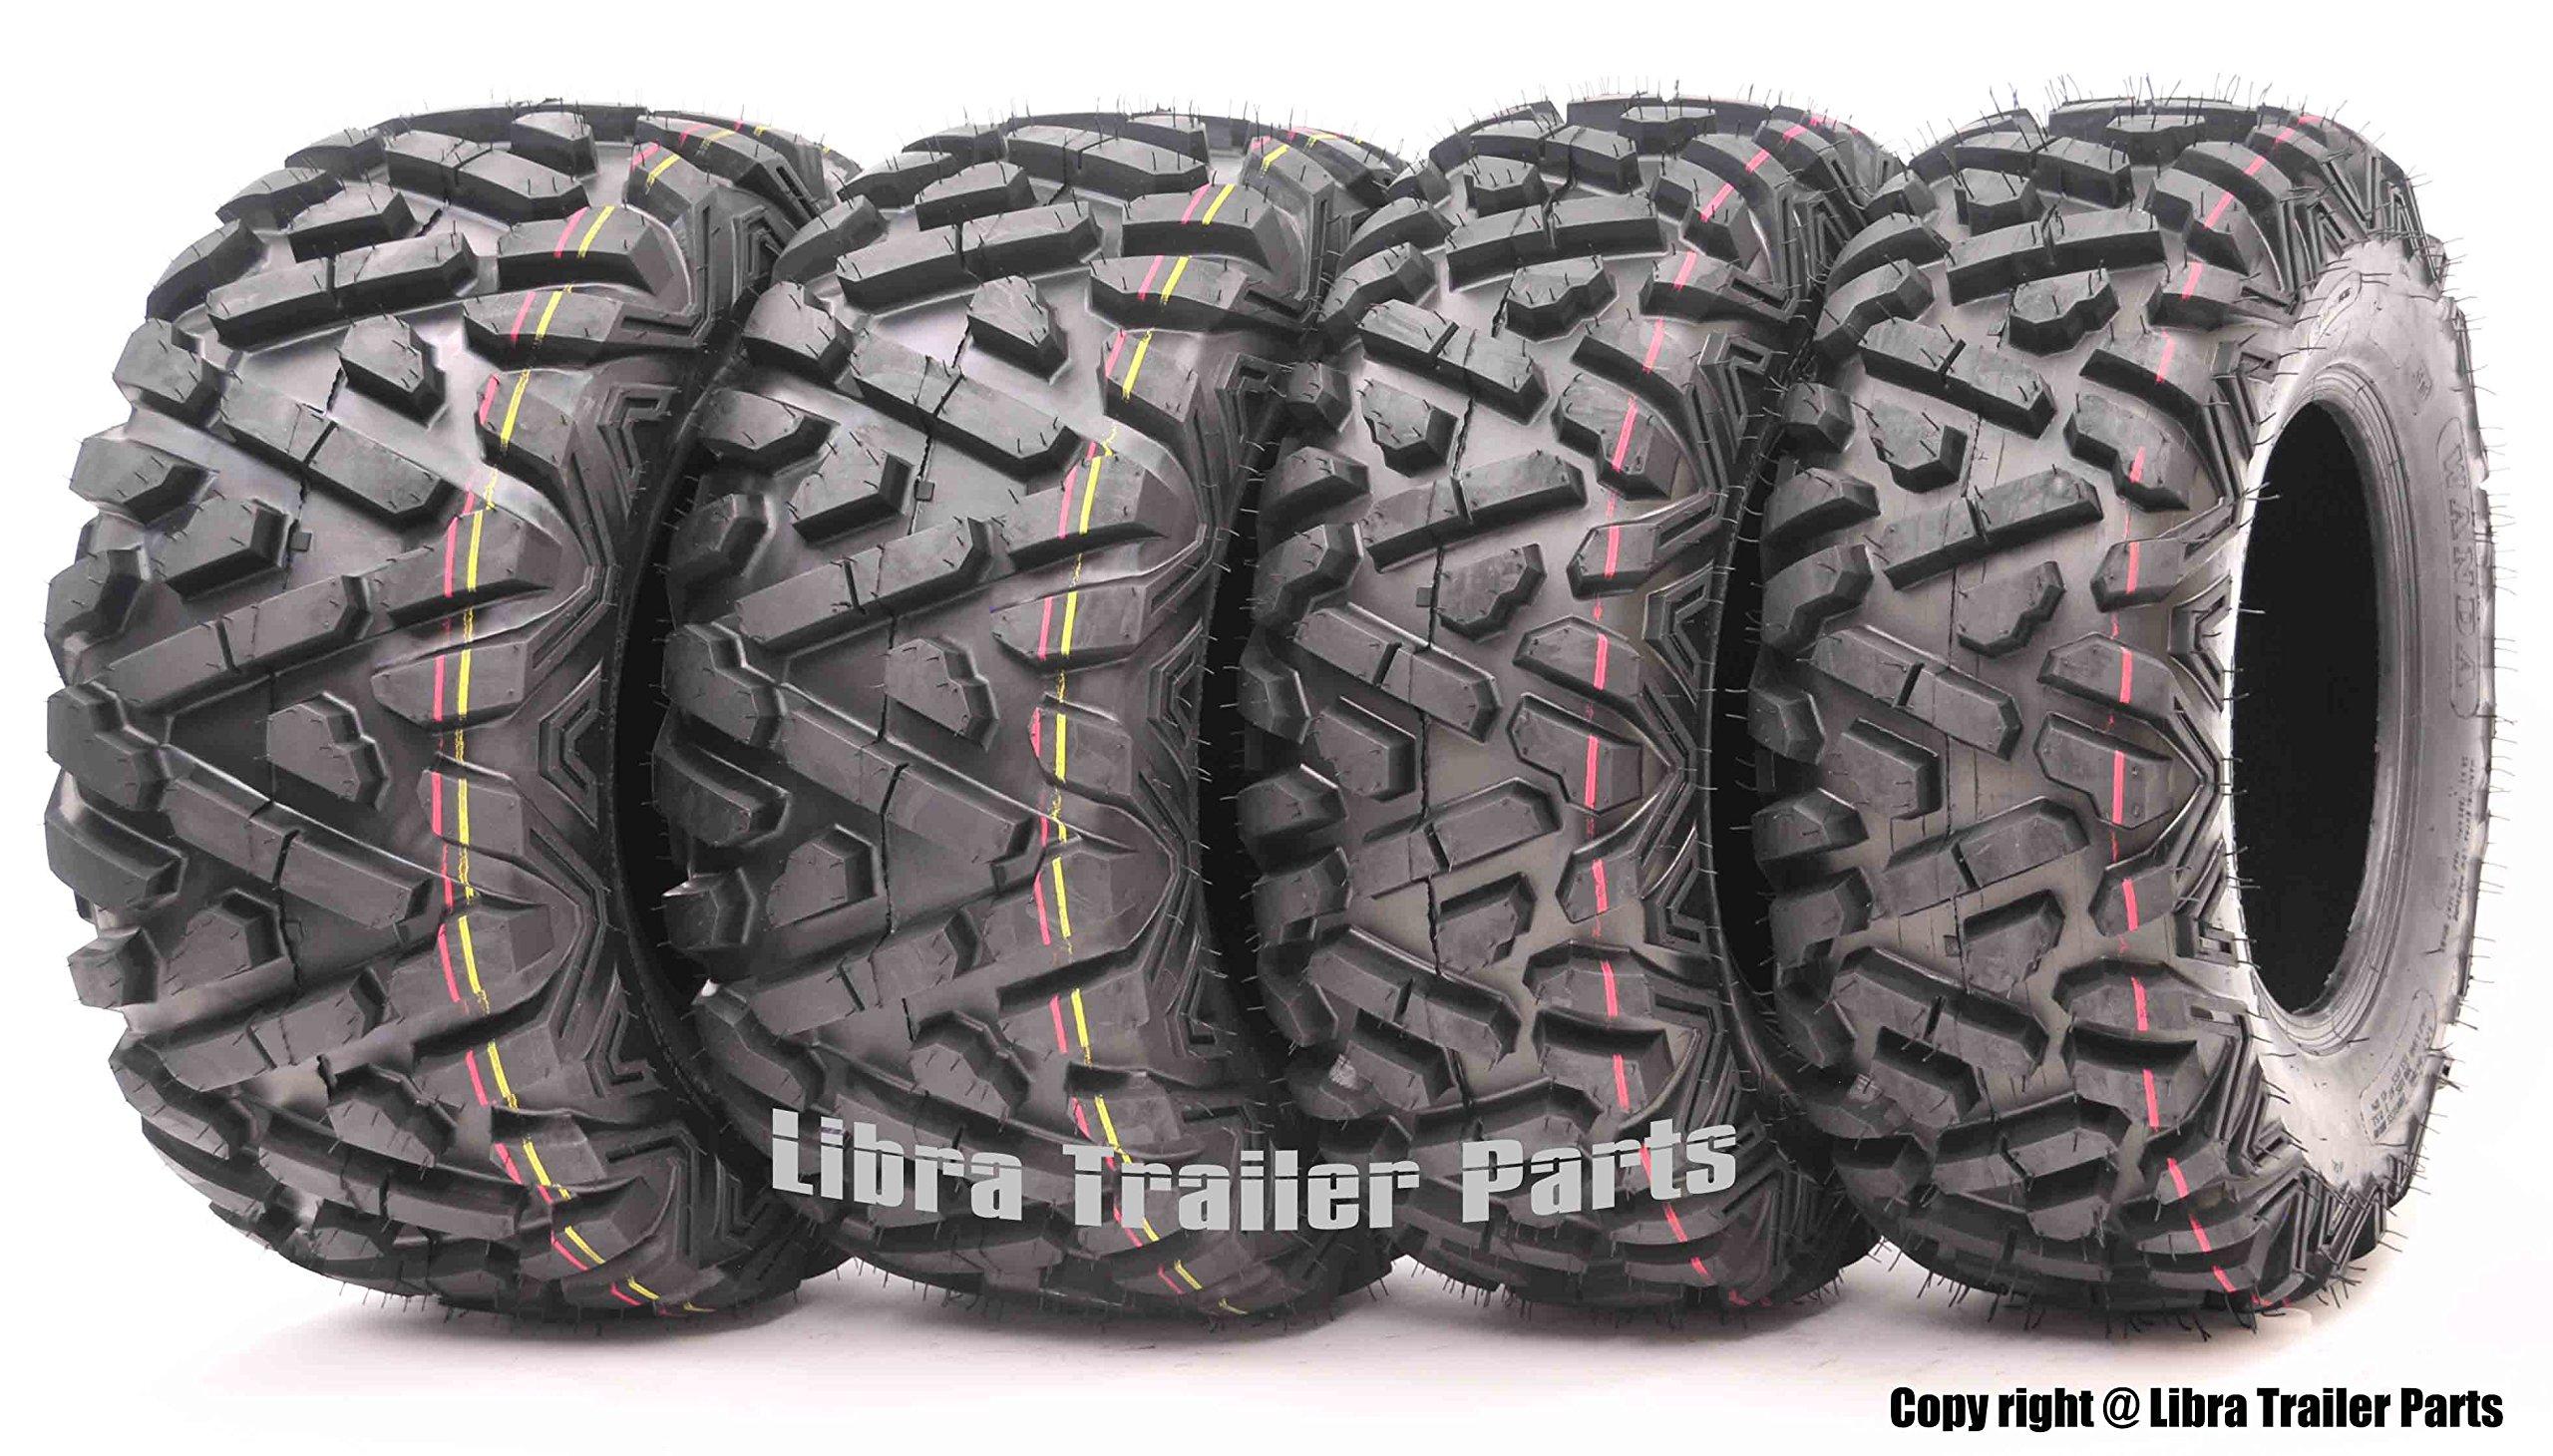 Set of 4 New WANDA ATV/UTV Tires 24x8-12 Front & 24x9-11 Rear /4PR P350 - Deep Solid Tread …